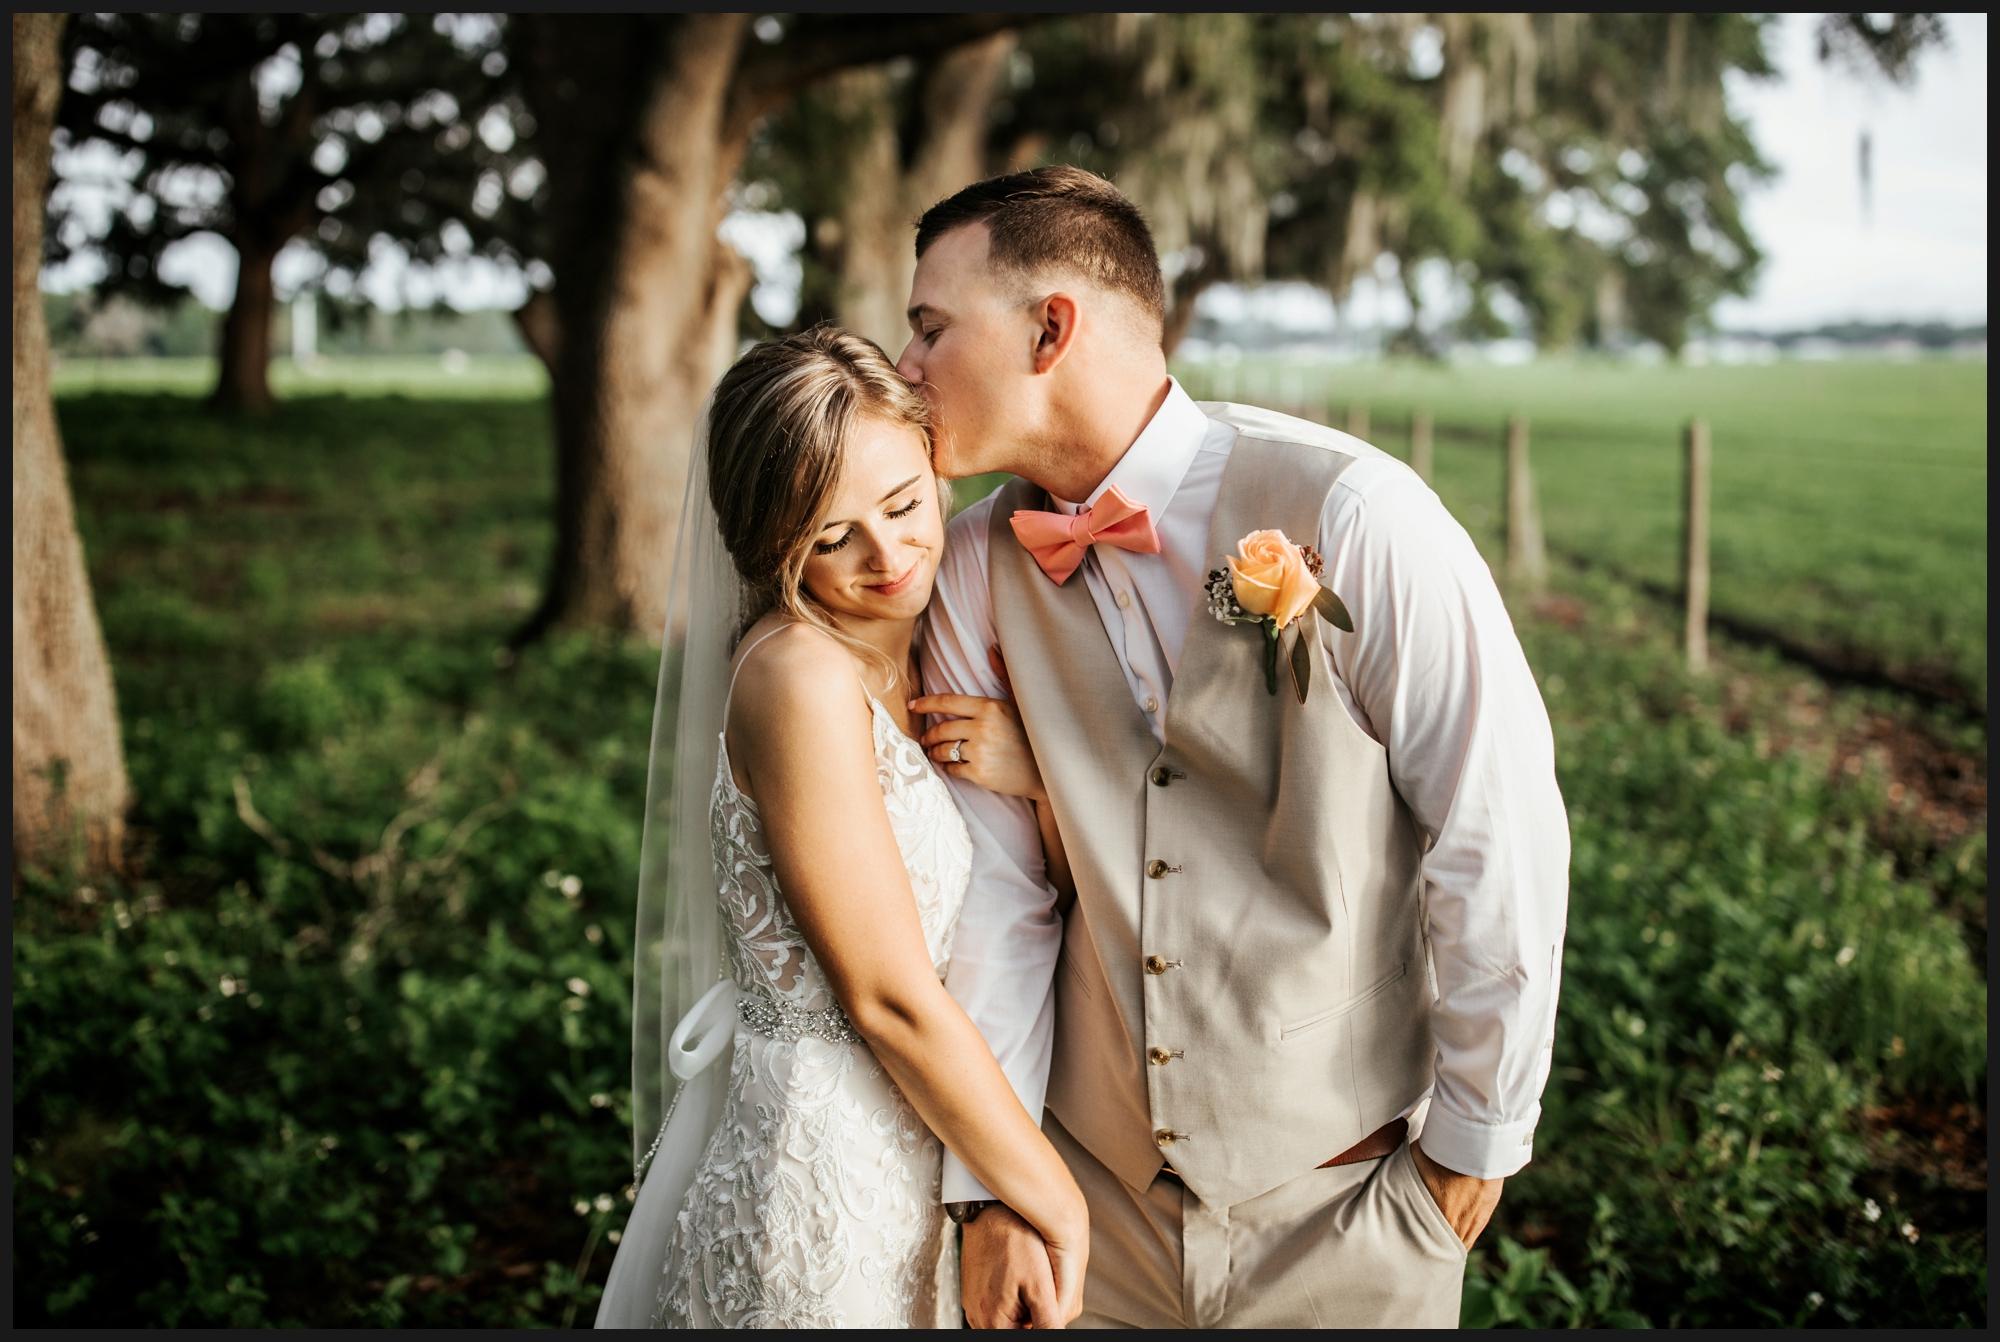 Orlando-Wedding-Photographer-destination-wedding-photographer-florida-wedding-photographer-hawaii-wedding-photographer_0325.jpg